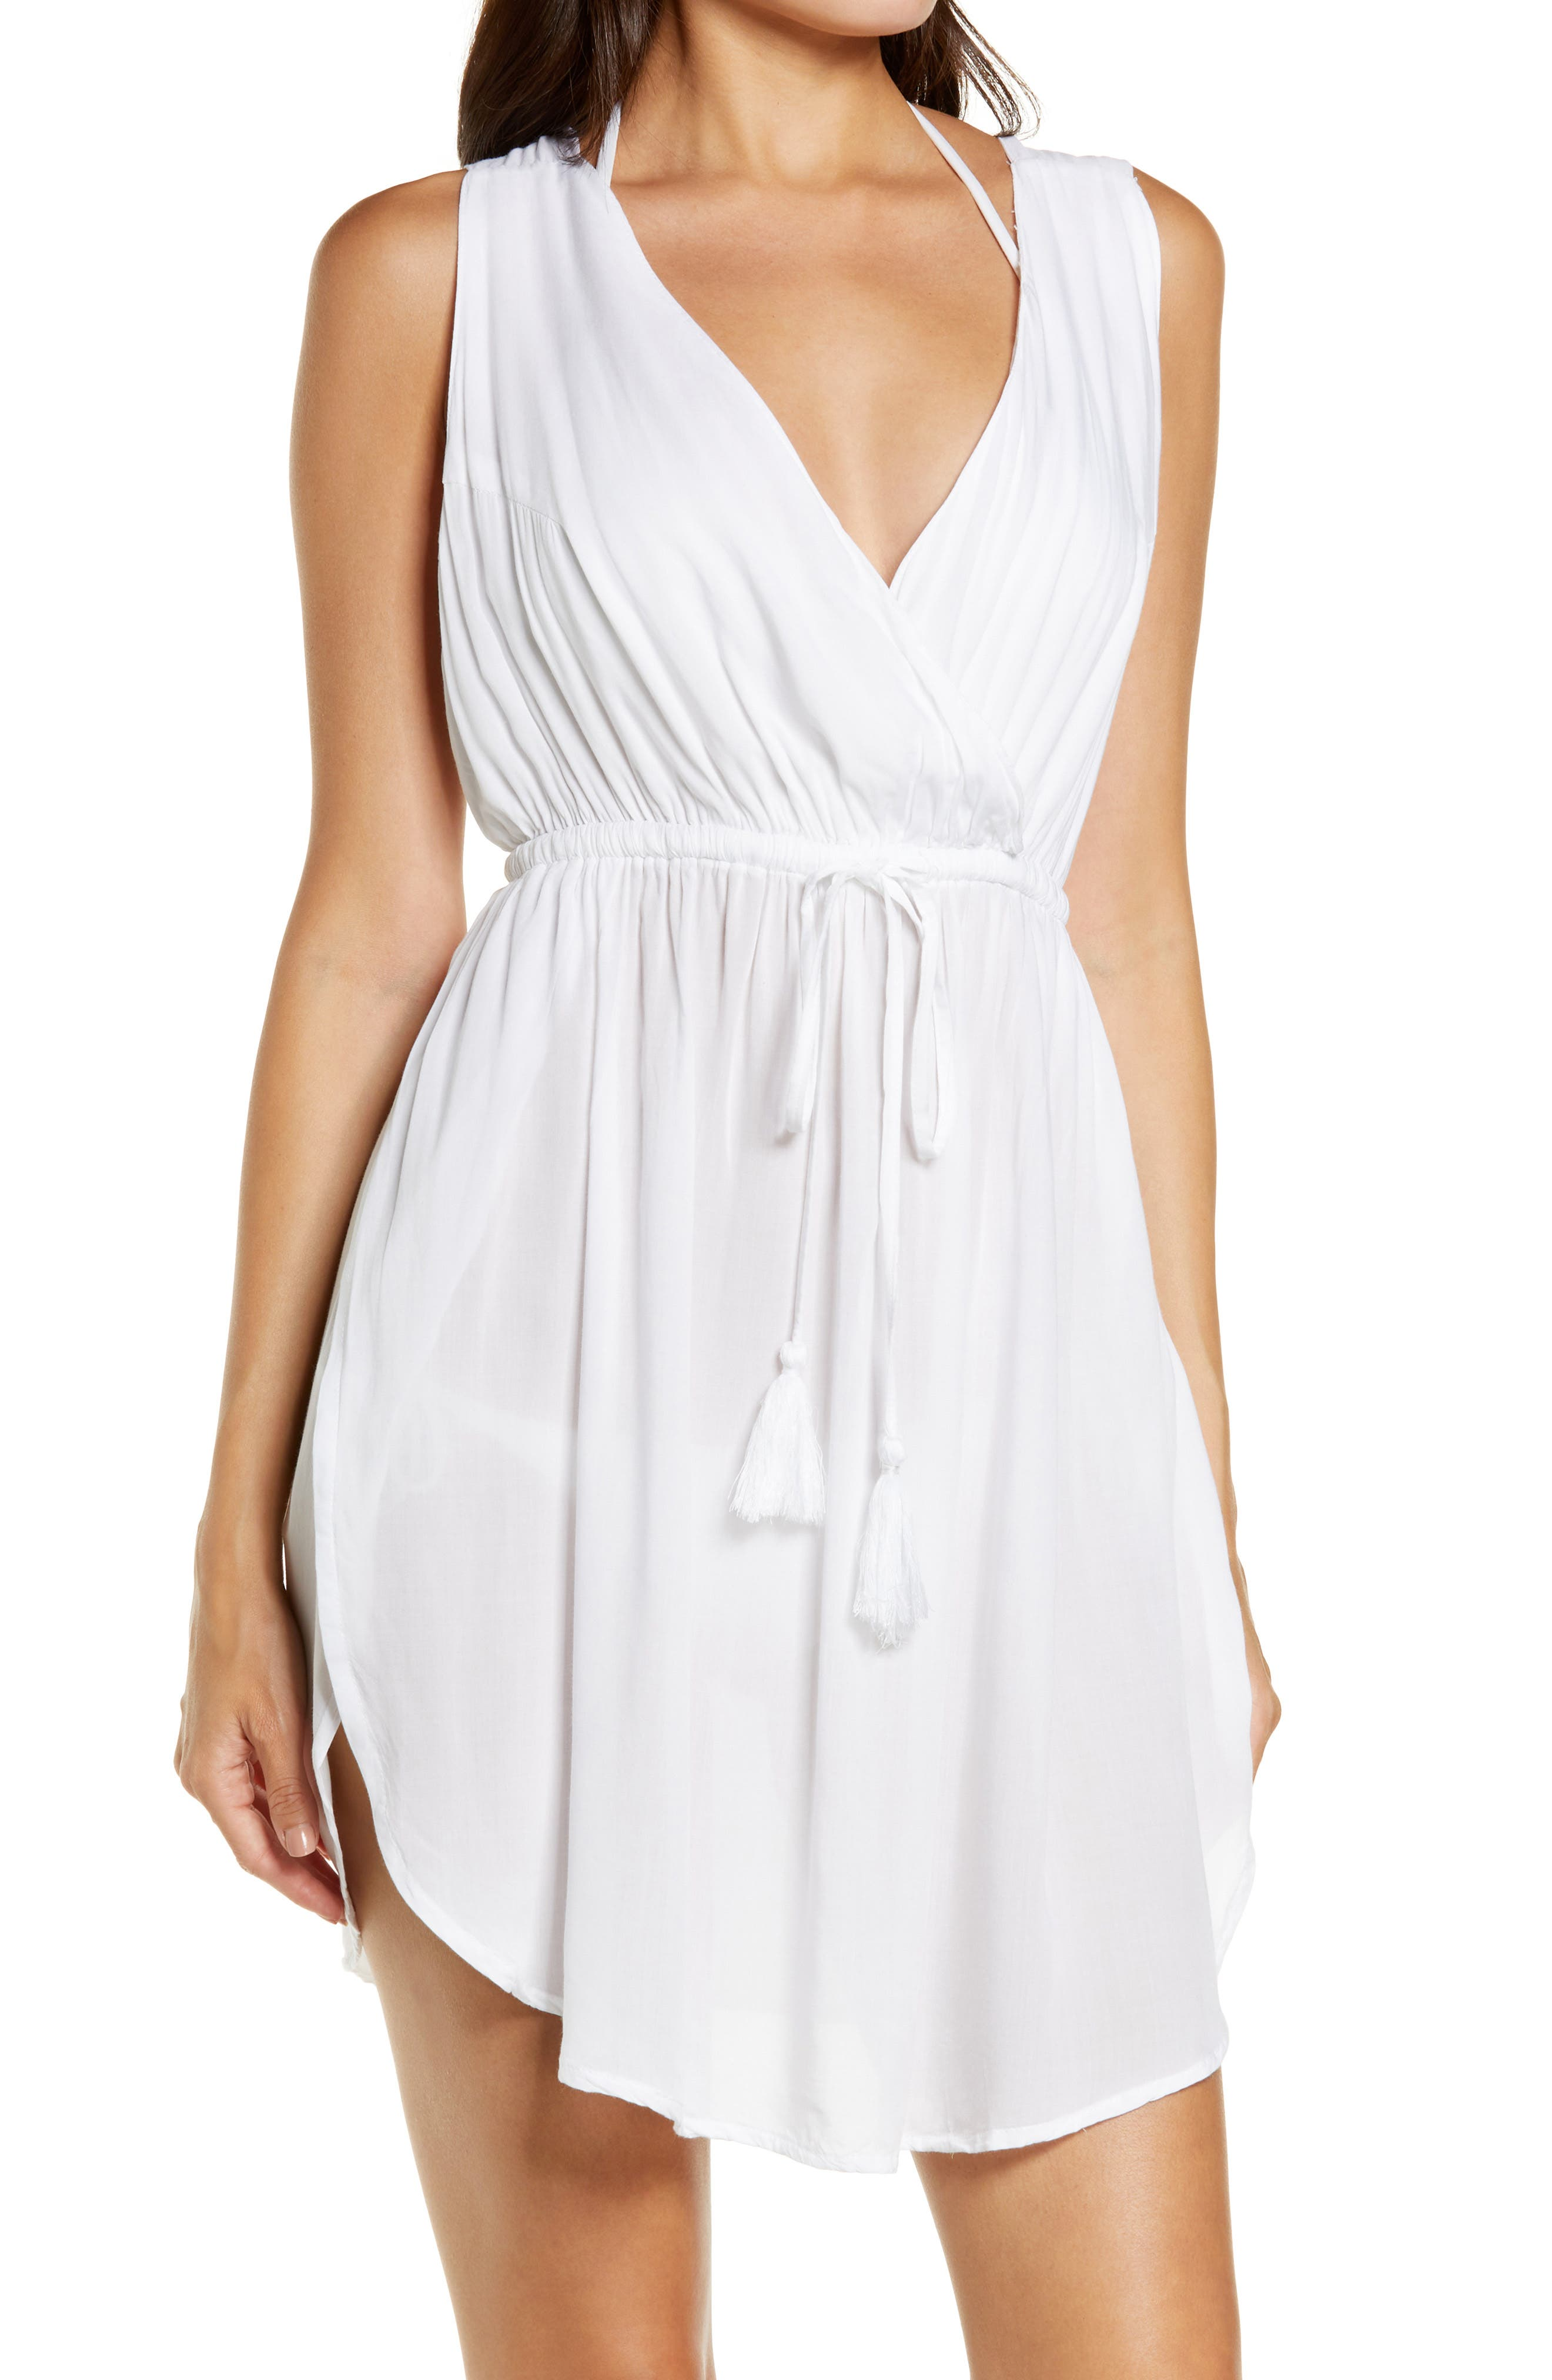 Slit Sides Sleeveless Dress